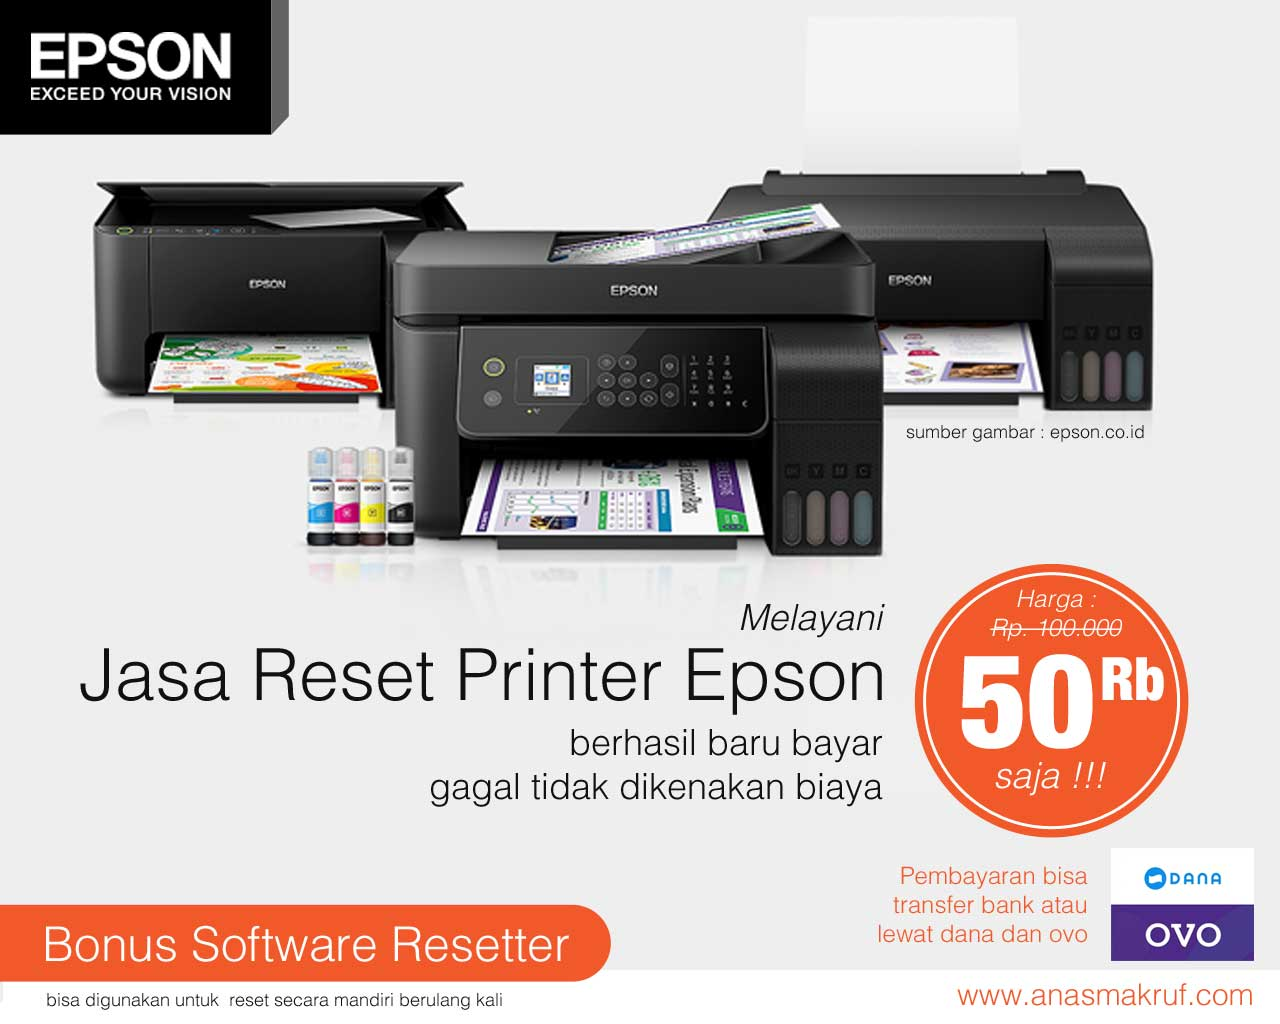 jasa reset printer epson online murah terpercaya garansi uang kembali